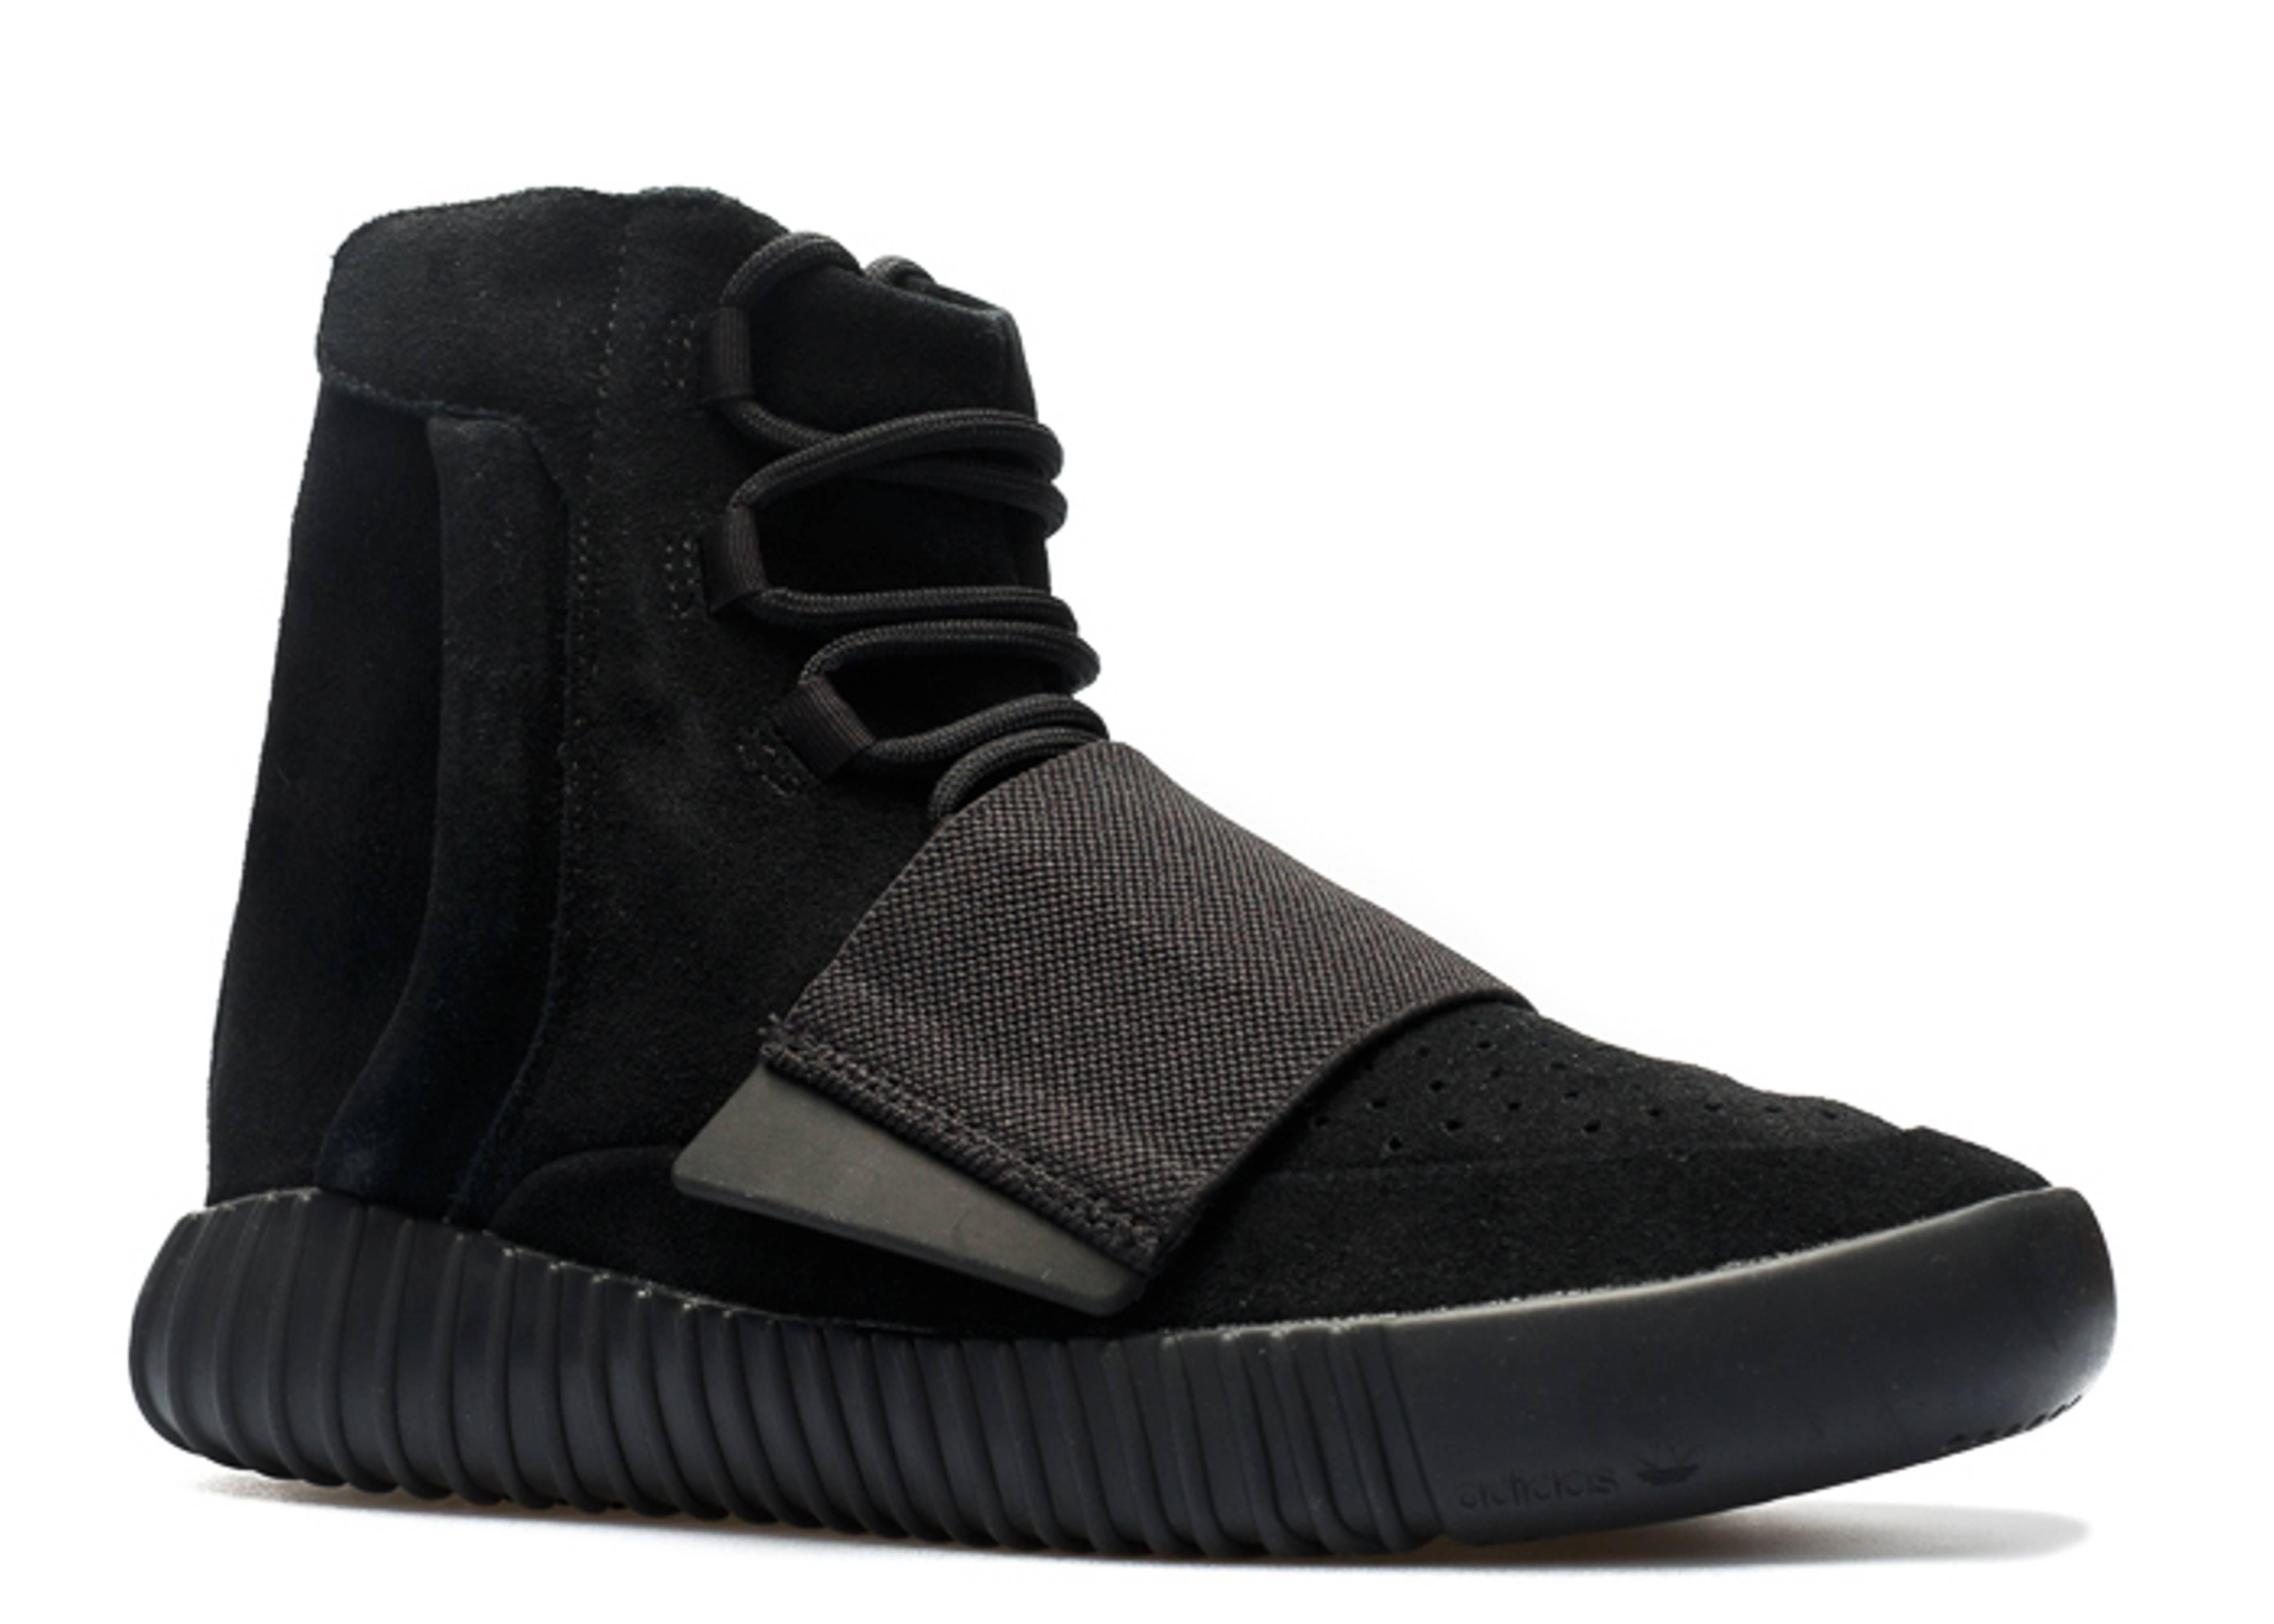 Tanzania grano Disipar  Adidas Yeezy 750 Boost Black SneakerNews com